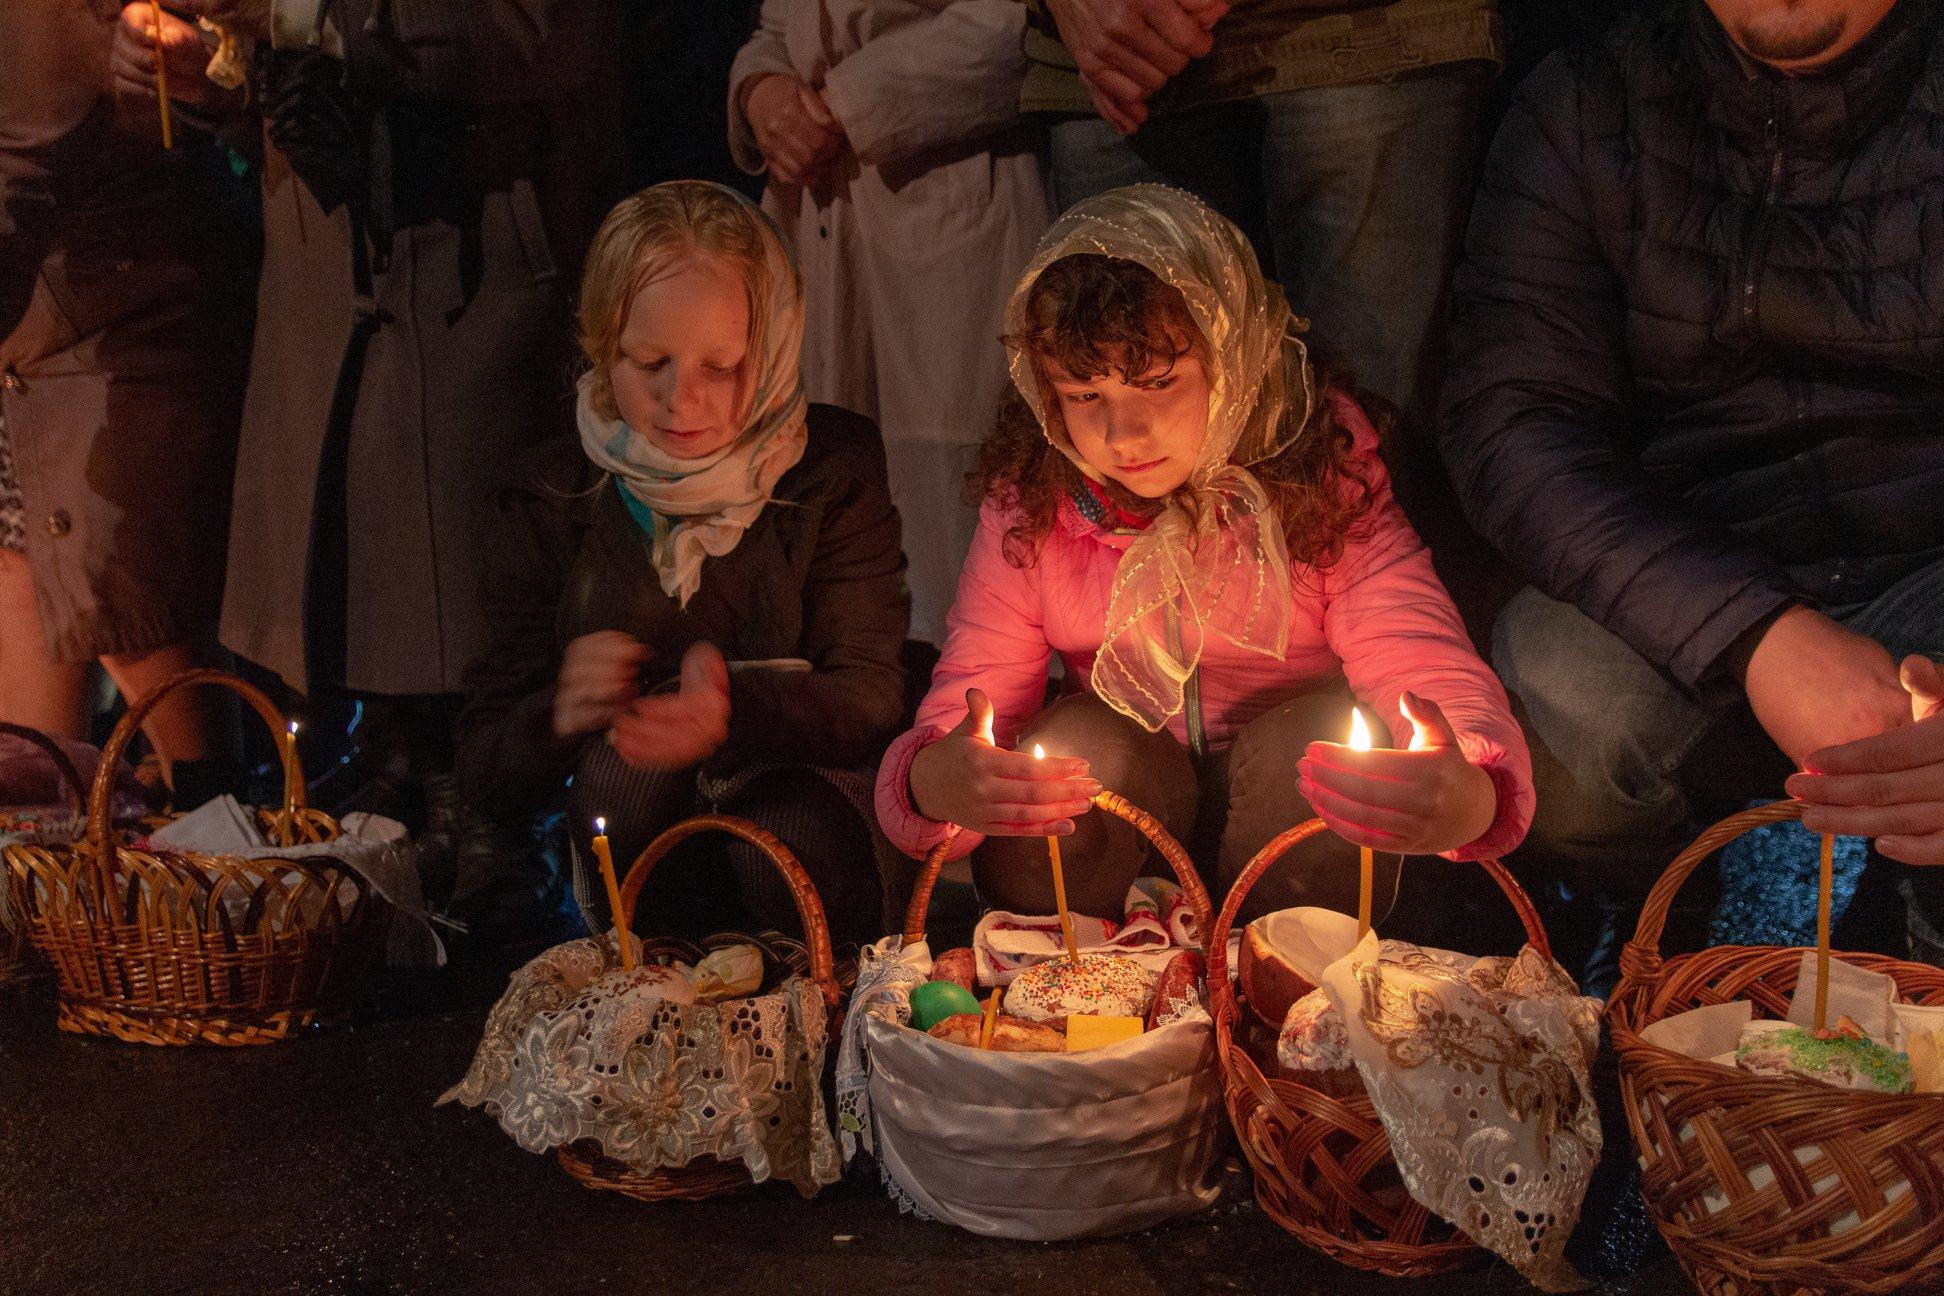 Як освячували паски у храмі монастиря поблизу Луцька